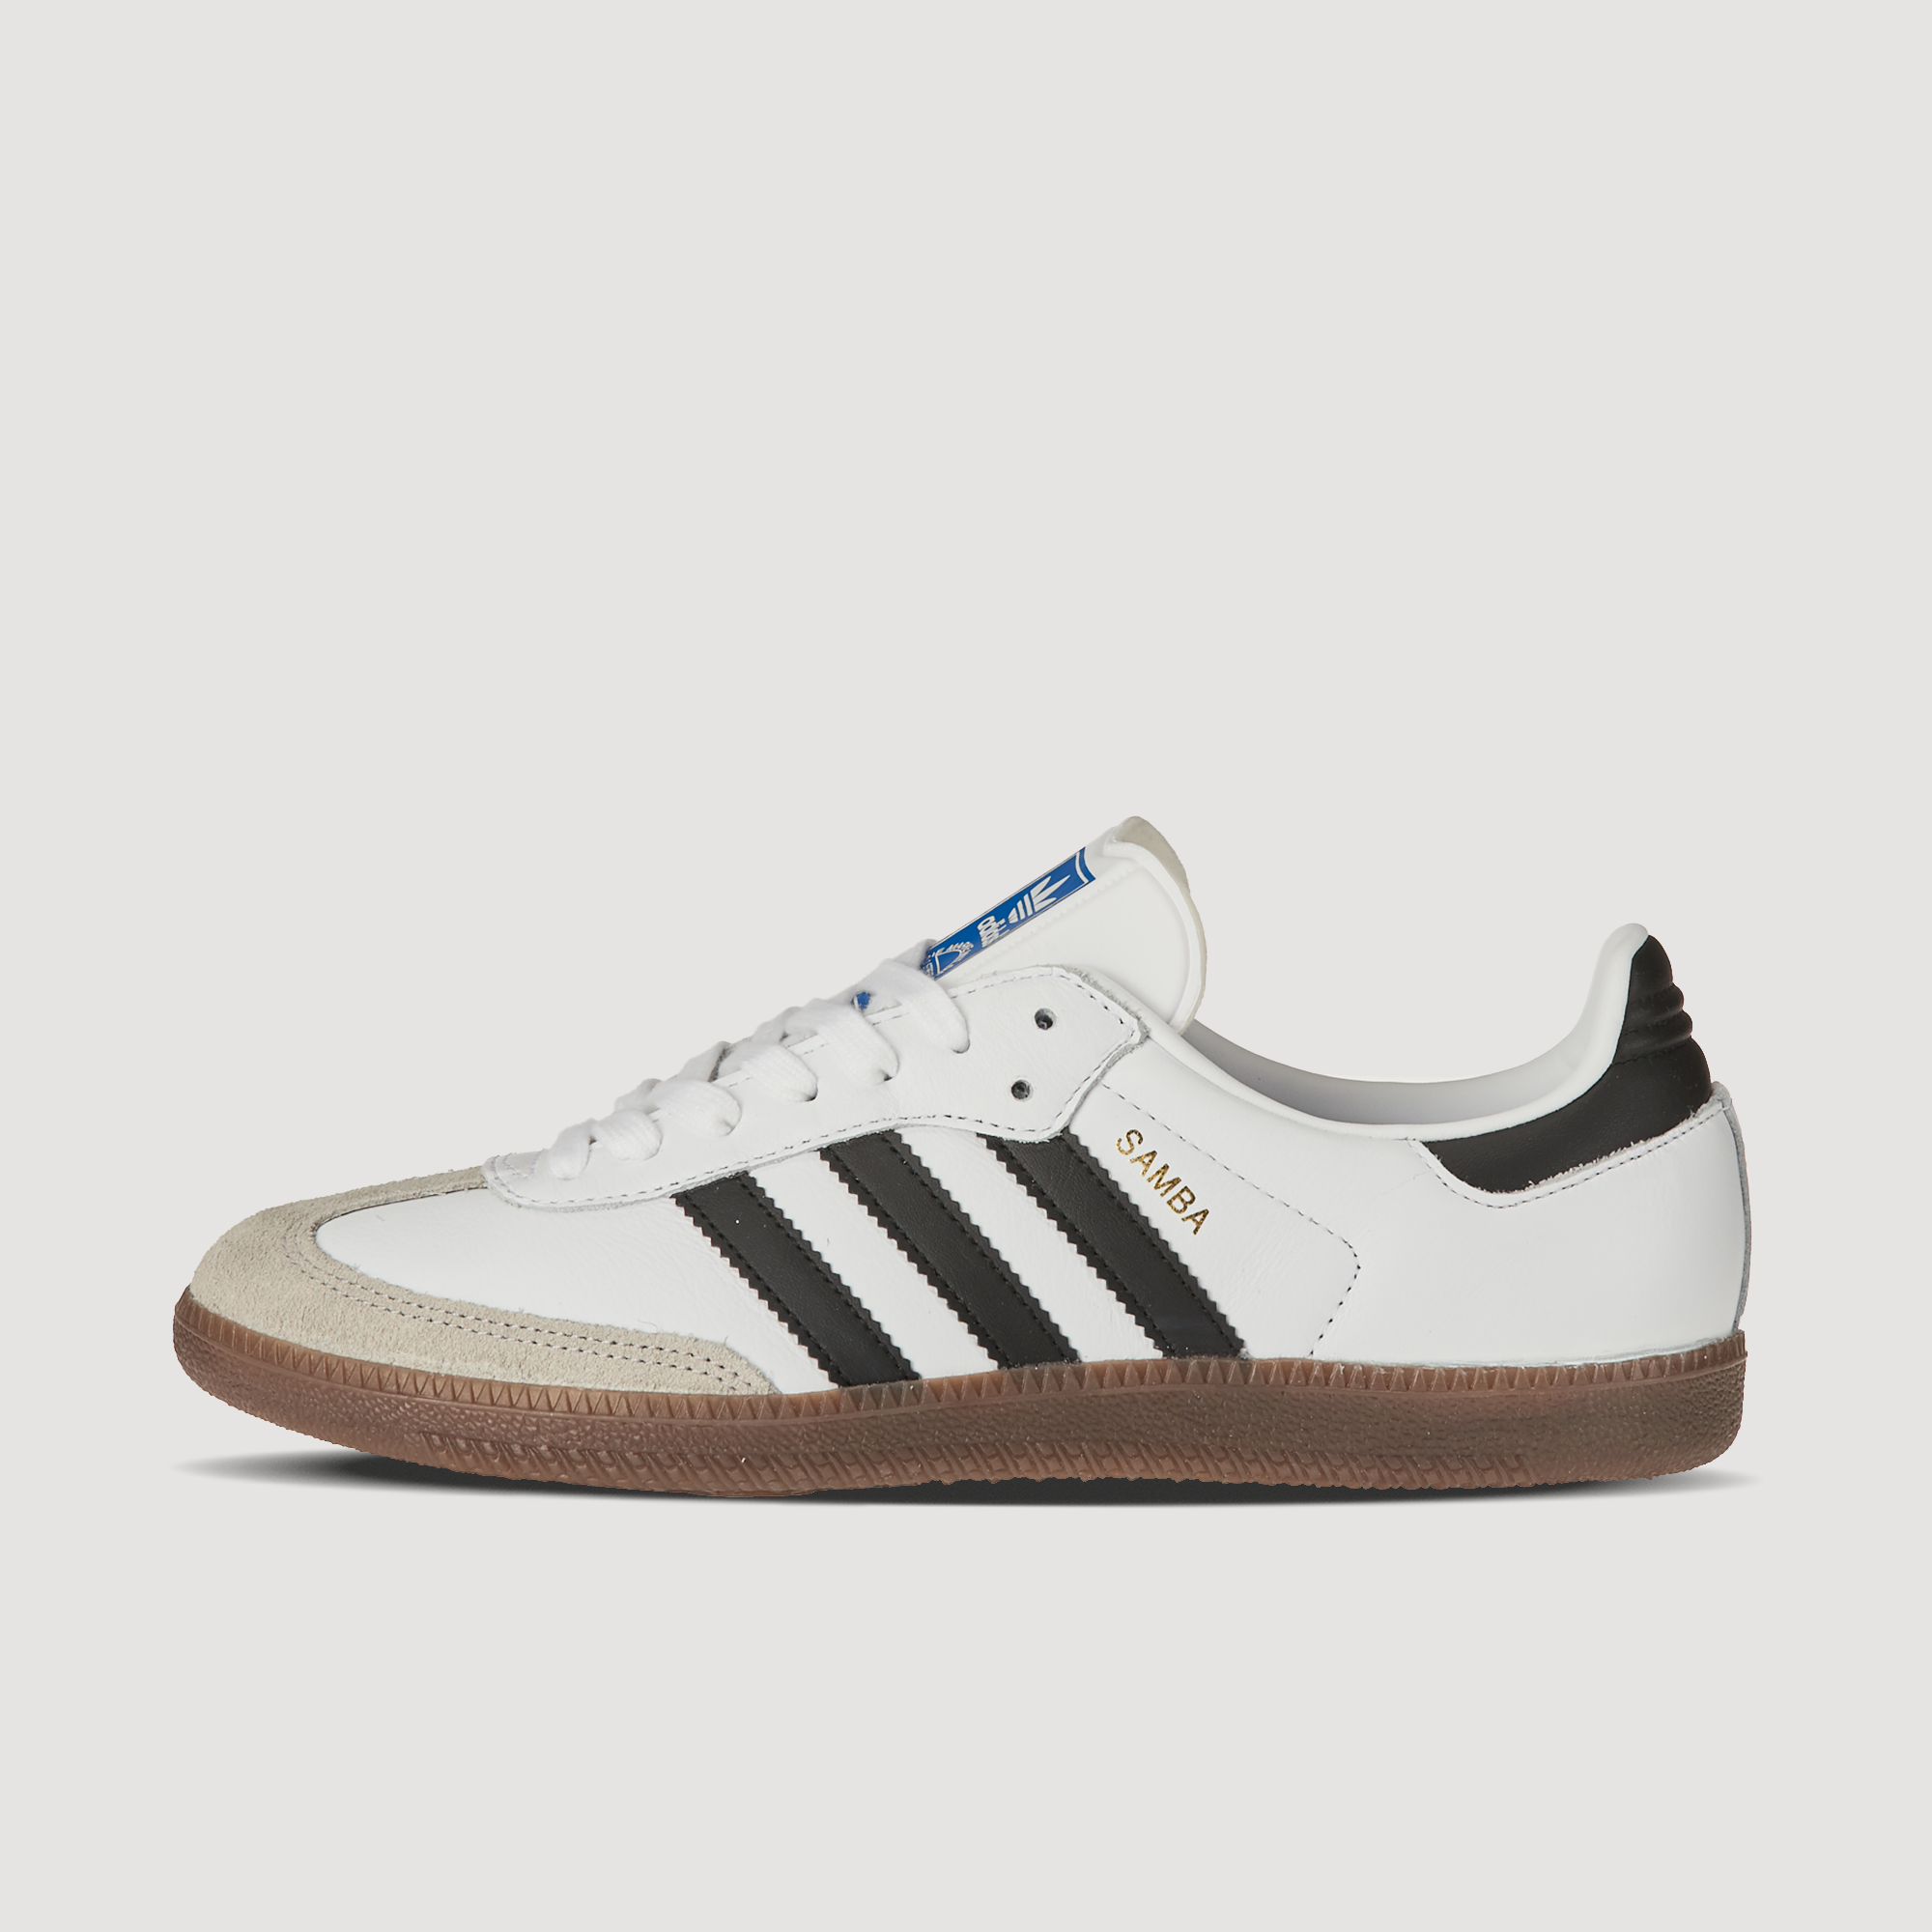 162602d062 SAMBA OG - Pig Shoes